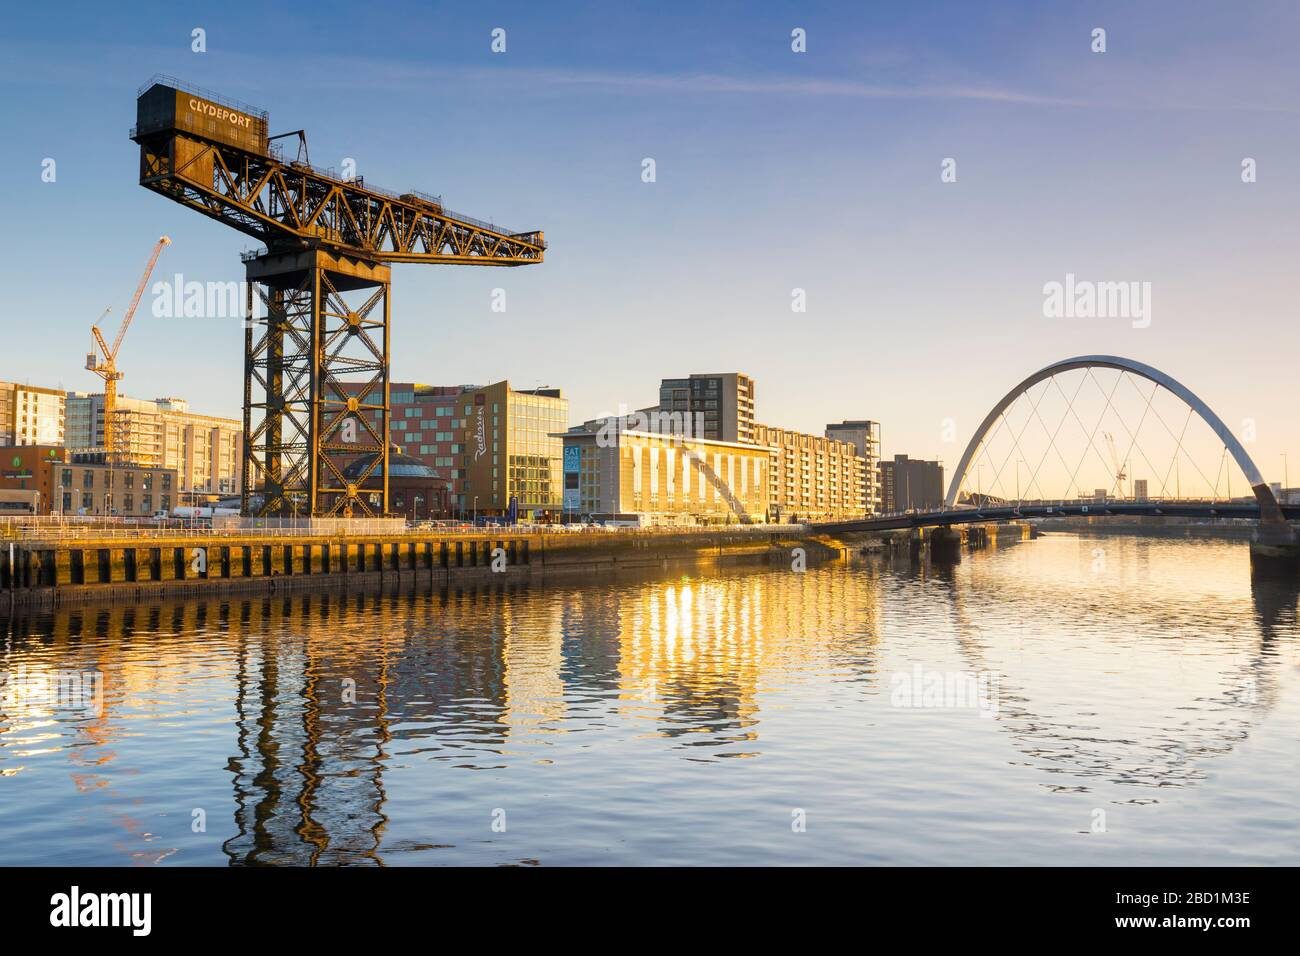 Finnieston Crane and Clyde Arc (Squinty Bridge), River Clyde, Glasgow, Scotland, United Kingdom, Europe Stock Photo